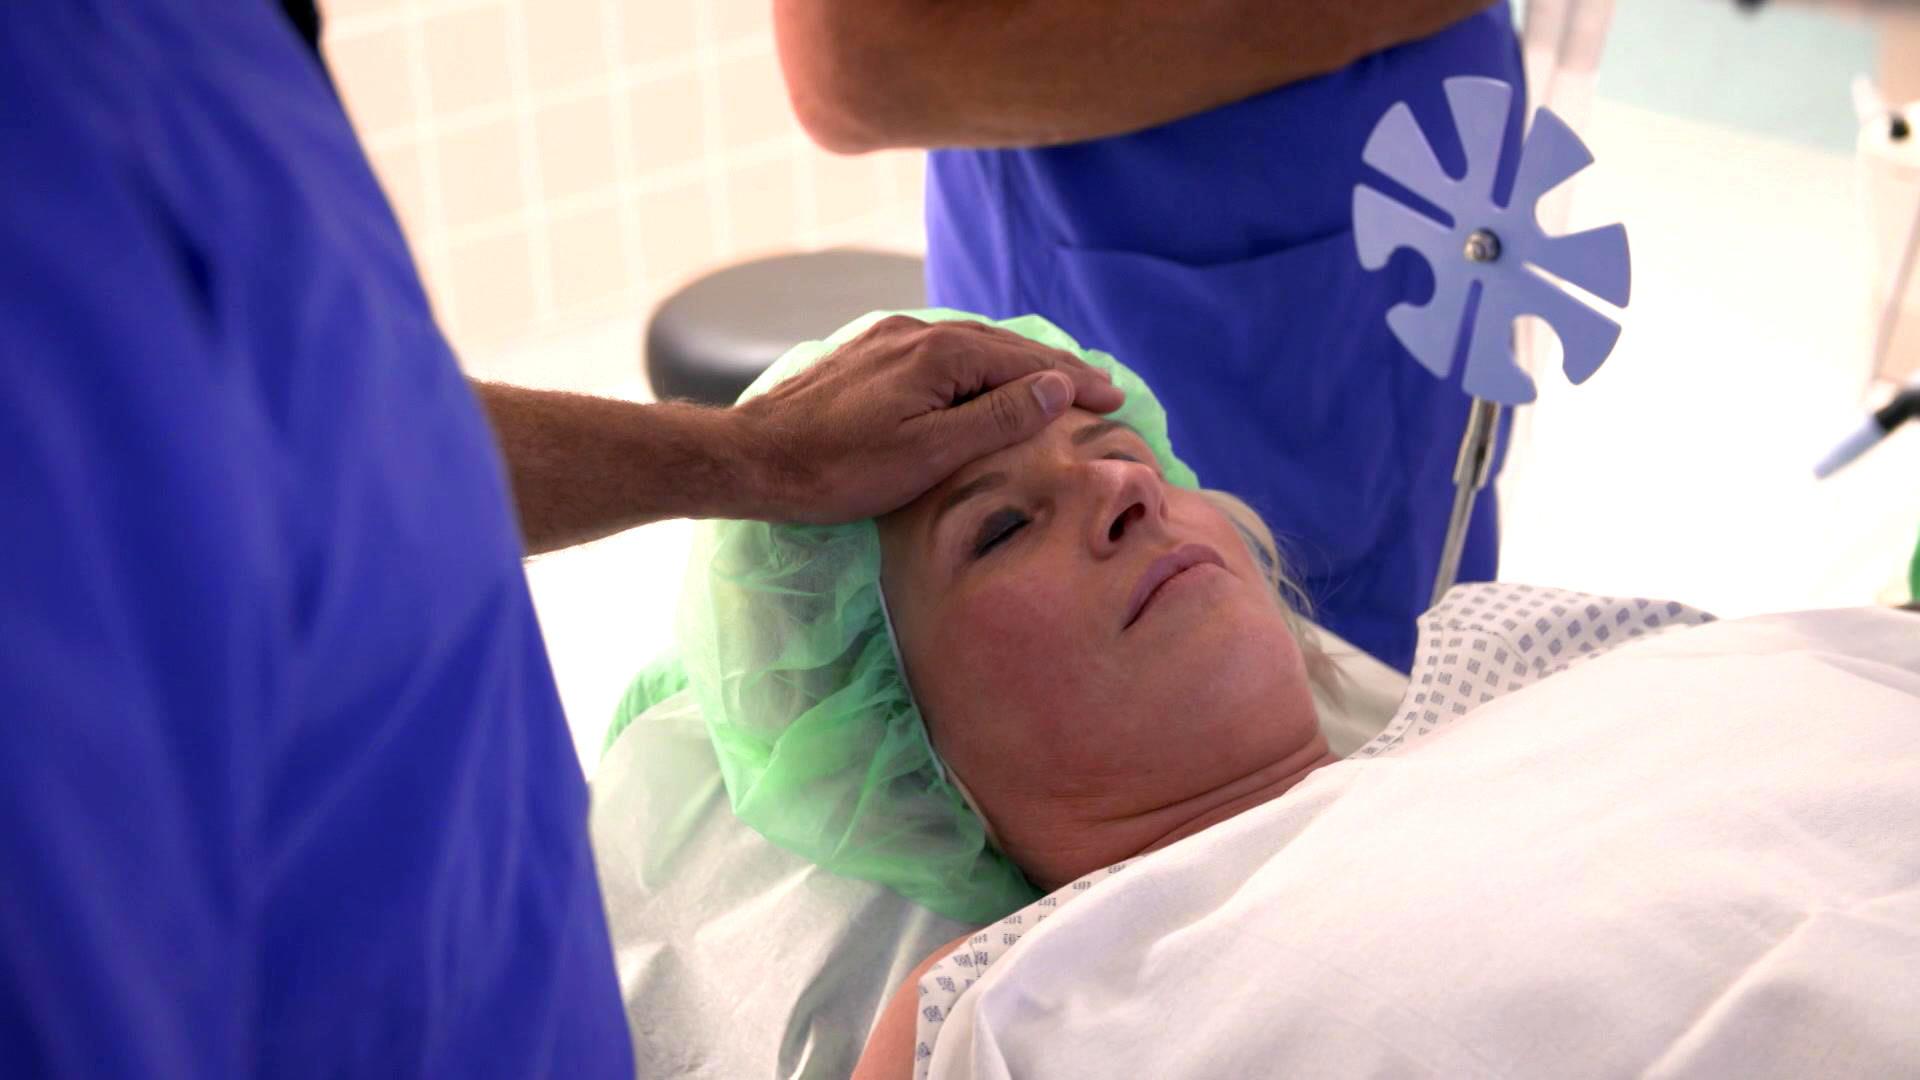 Chirurg Dr. König rettet eine Mutter   Folge 39